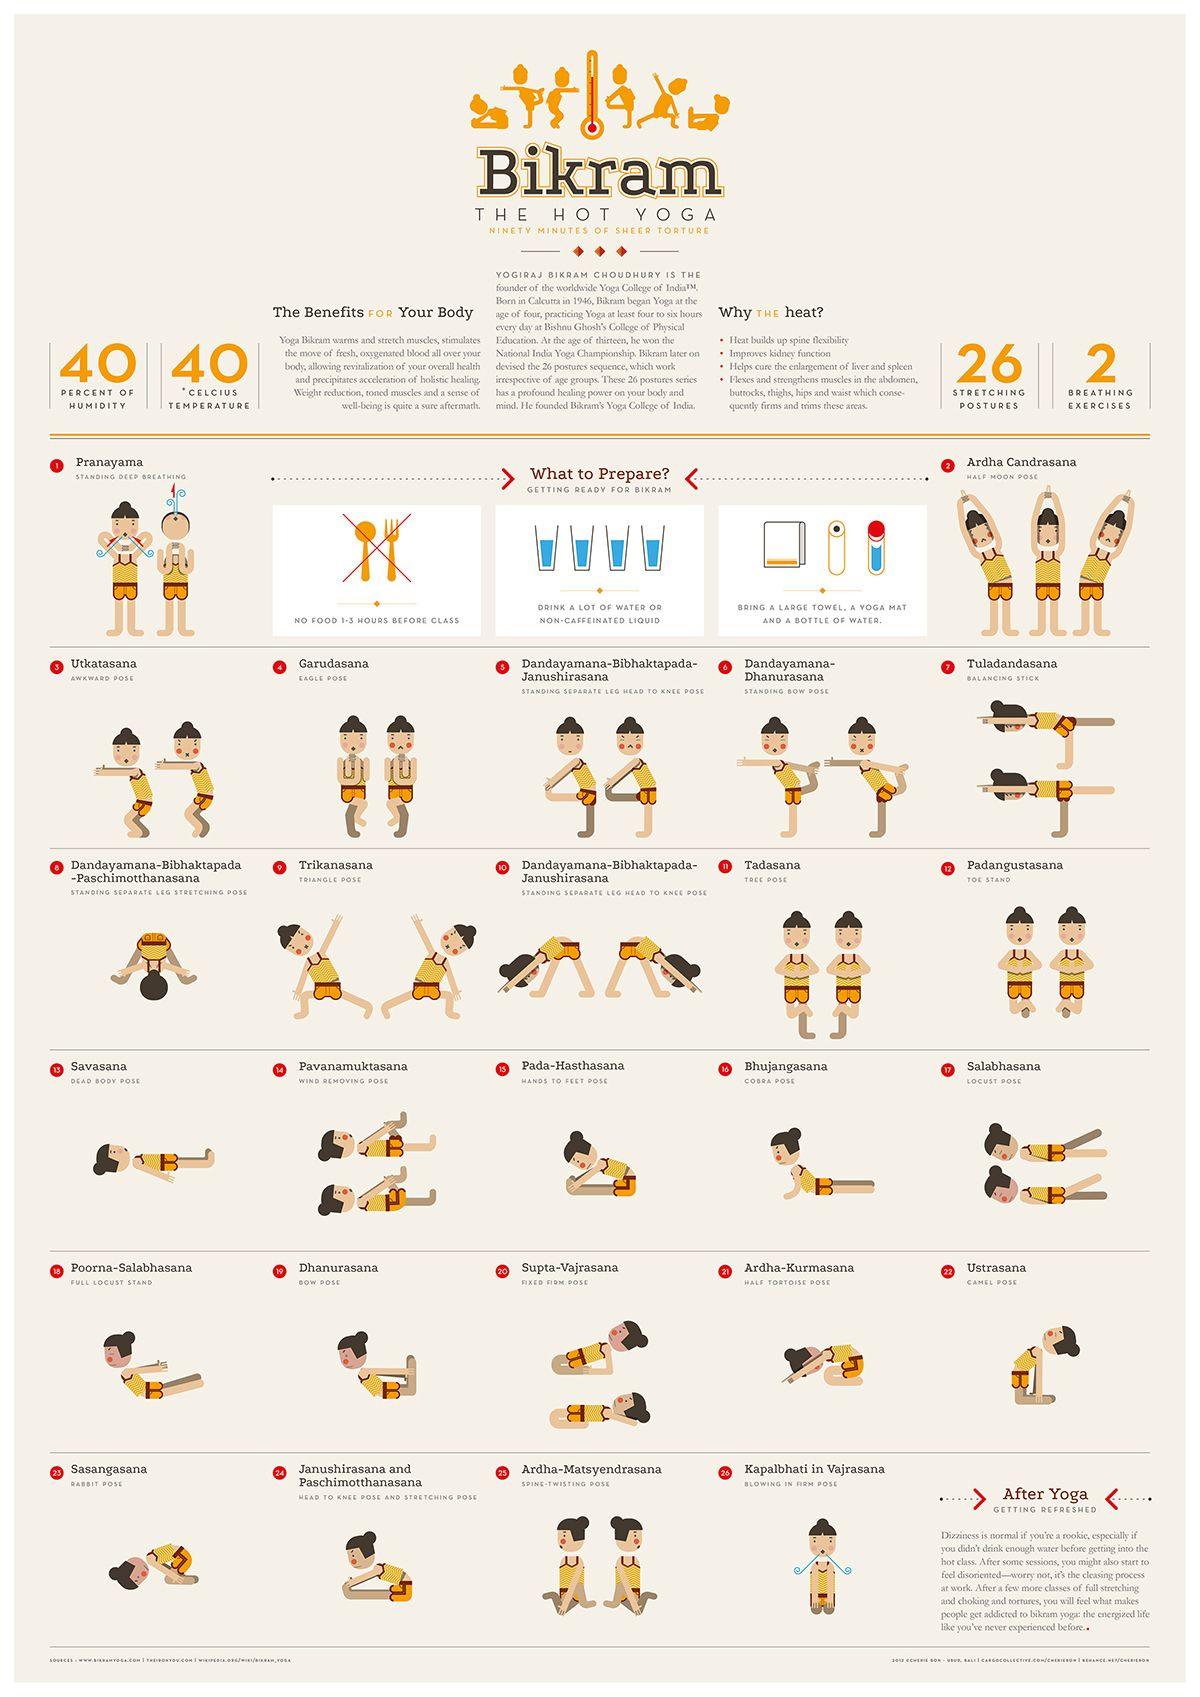 Bikram Yoga Pose Sequence Infographic  Träning, Träna, Reflexologi